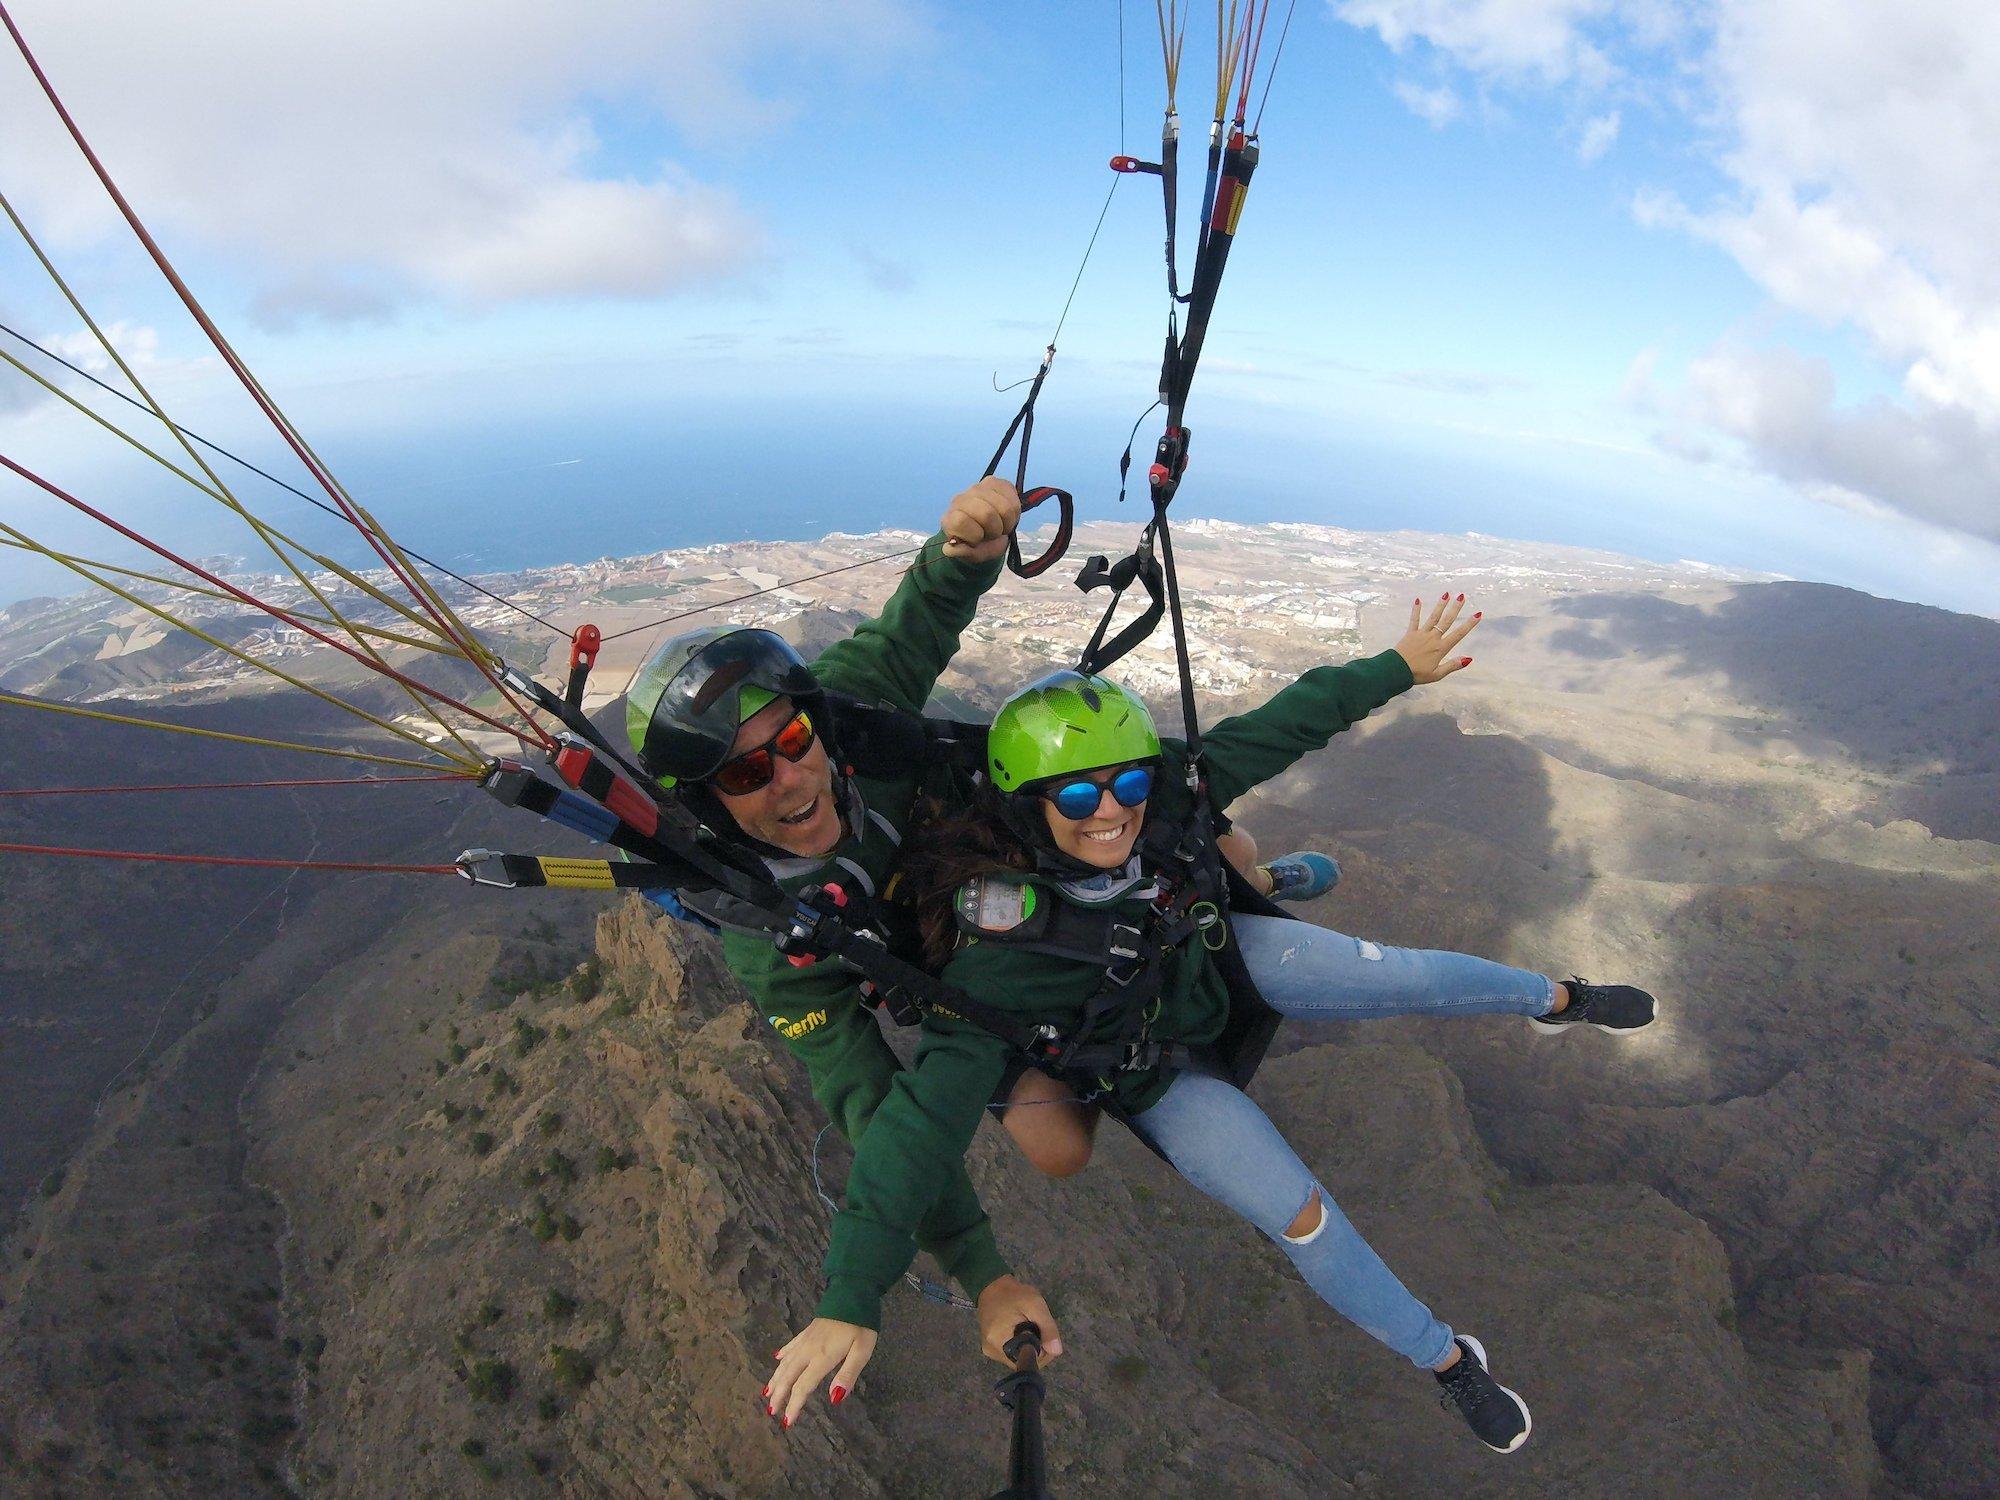 Performance Paragliding Flight In Tenerife_4